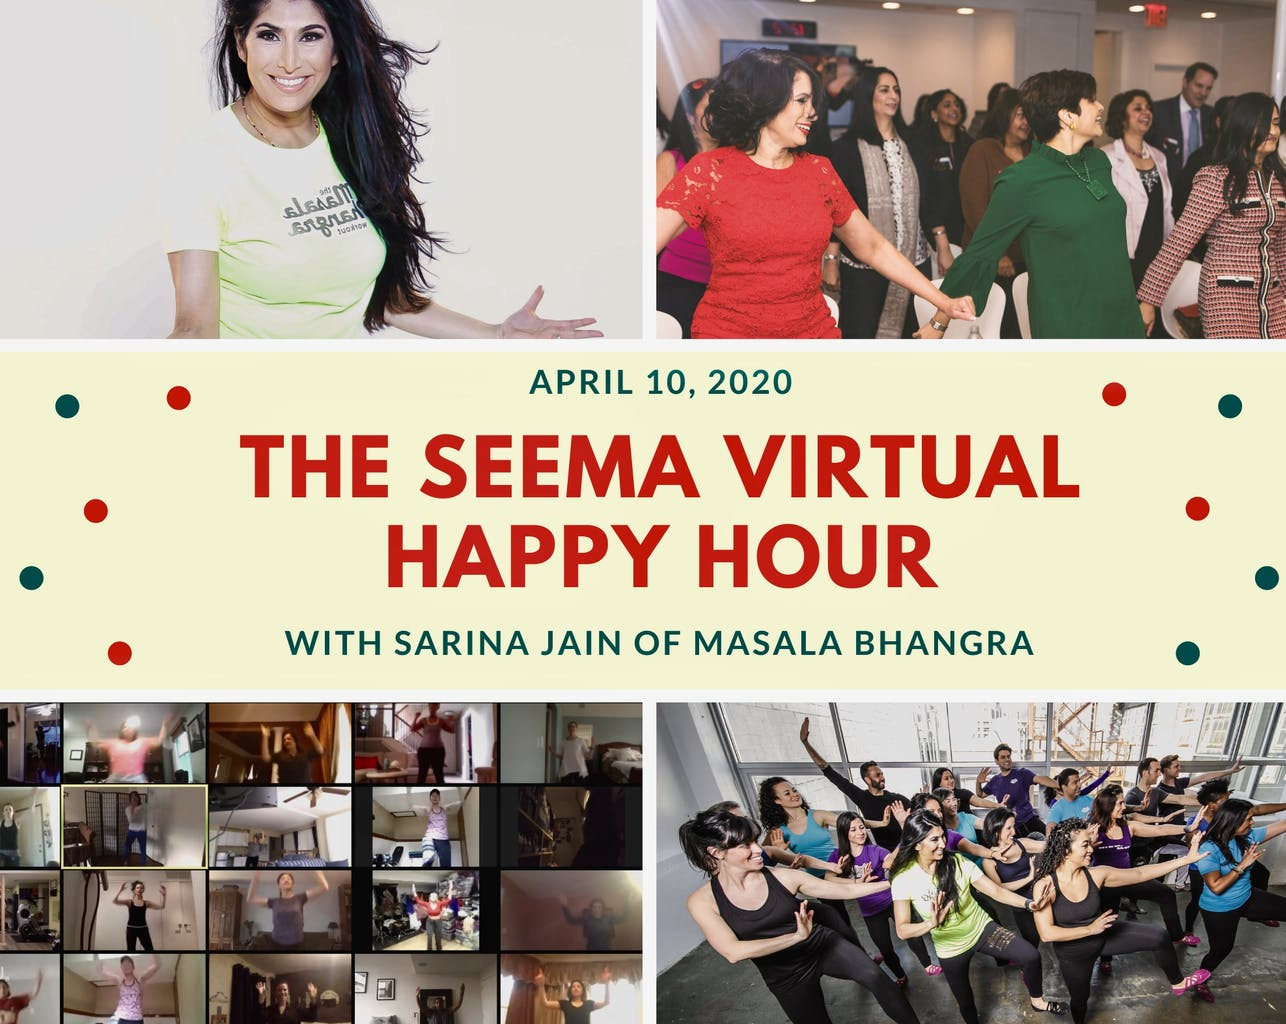 seema.com, seema network, seema virtual happy hour, seema social, Sarina Jain, Masala Bhangra, happy hour, stayathome, flattenthecurve, ball balls, South Asian fitness, Indian fitness, get moving with Sarina Jain and seema